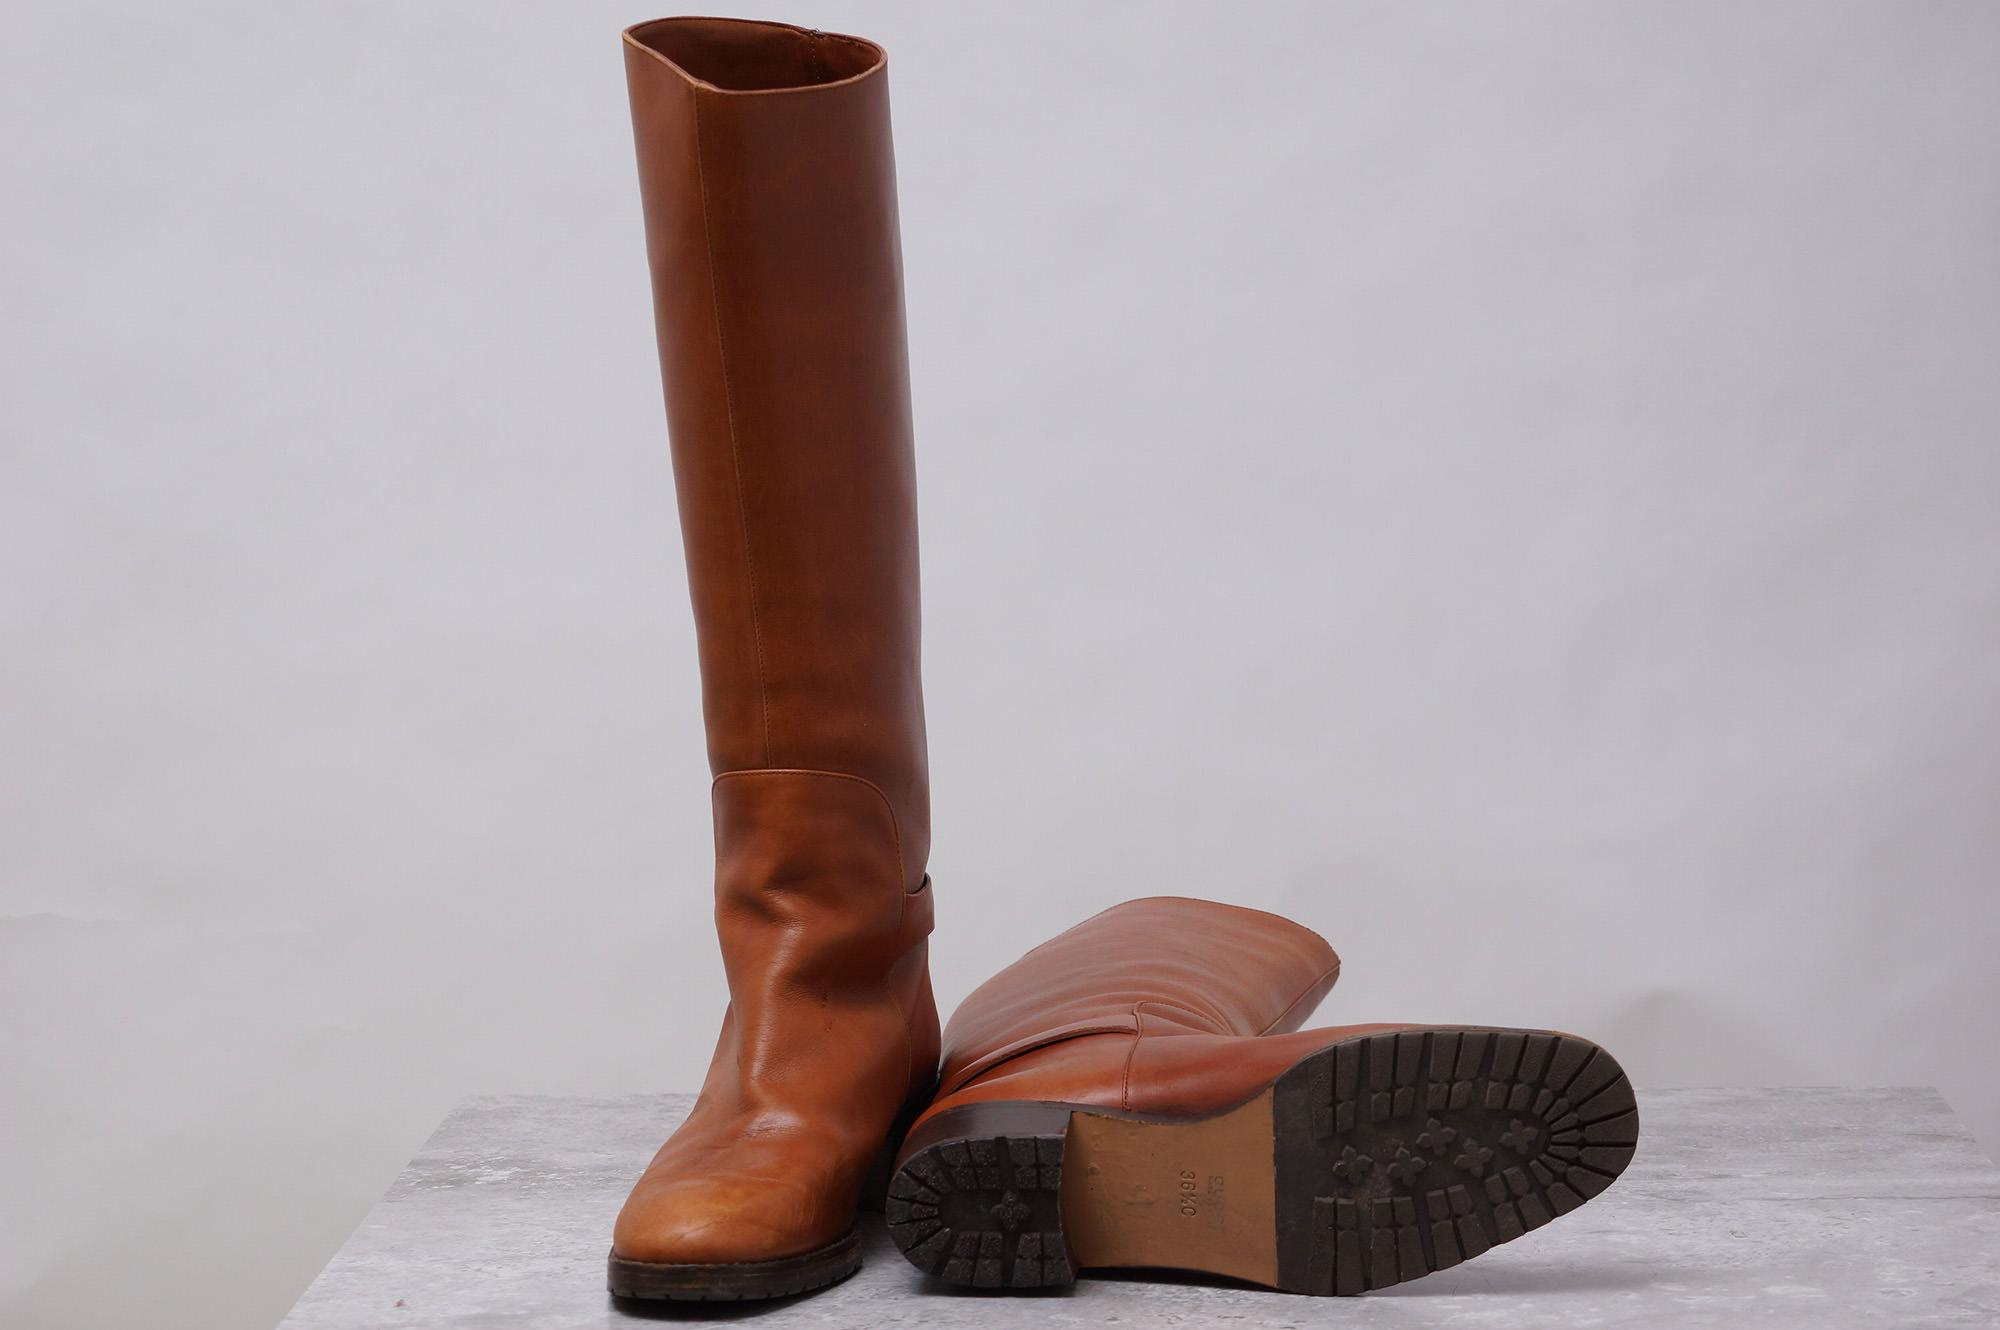 c71793d6092f グッチ / GUCCI ブーツ レディース ブラウン 茶 ロングブーツ 乗馬ブーツ ...